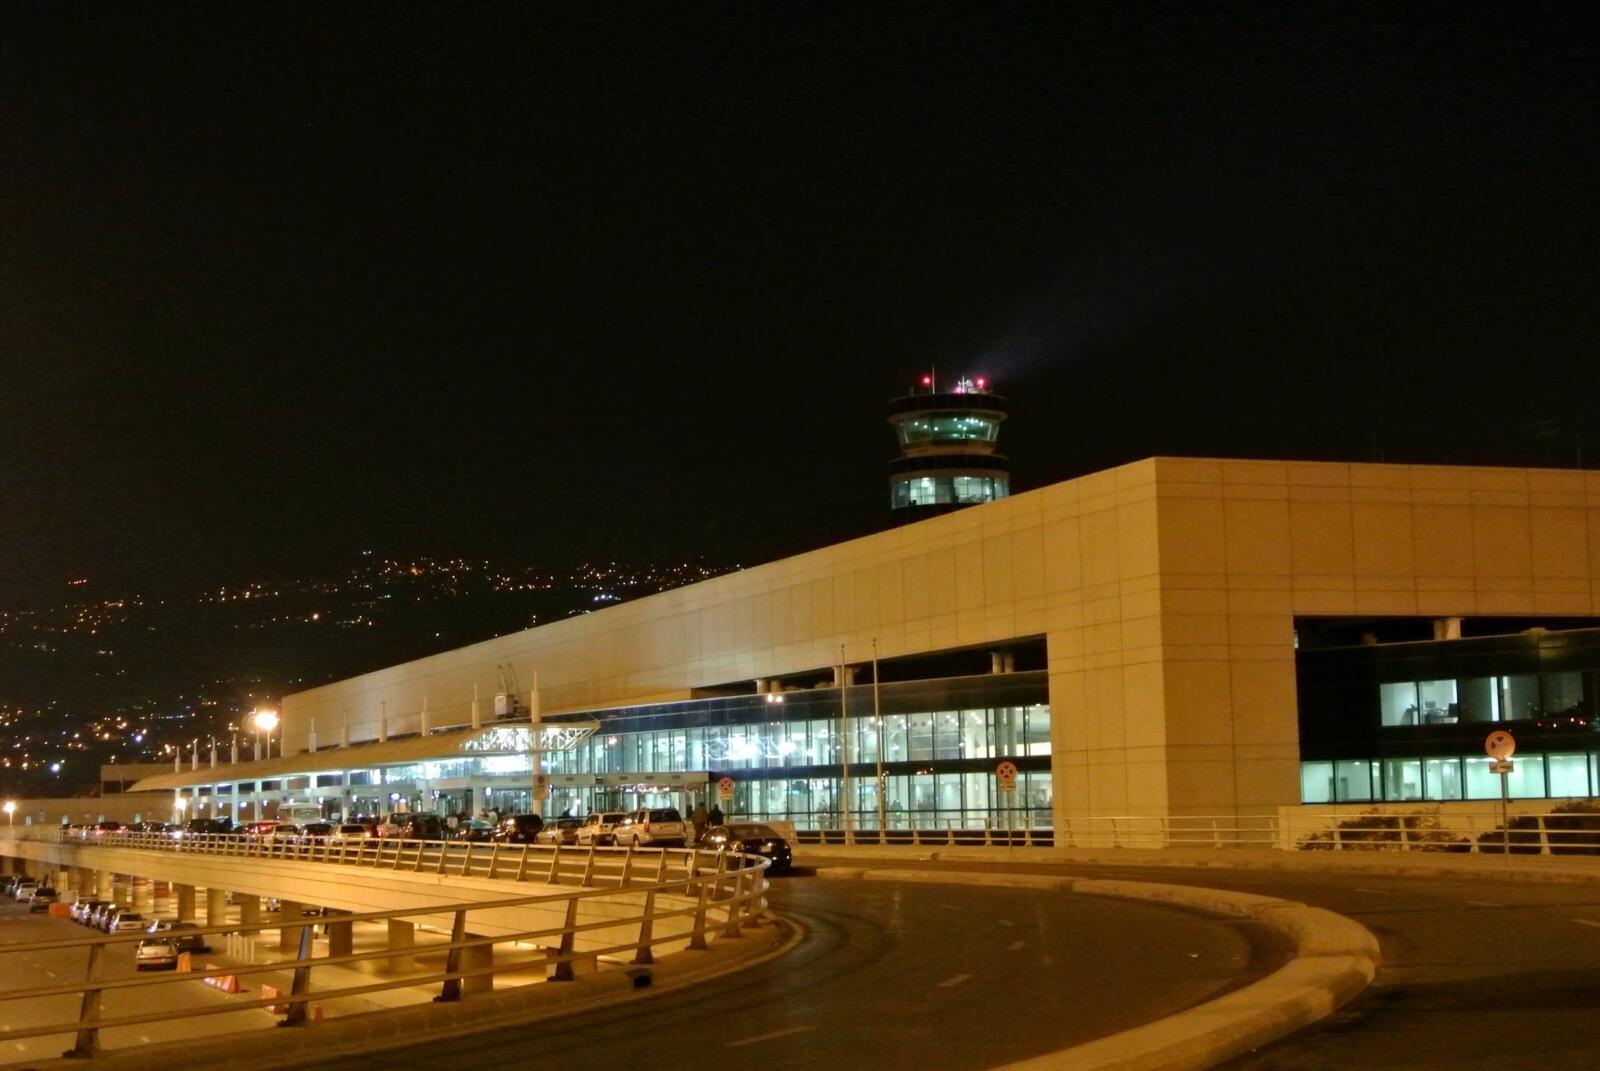 The Beirut Rafic Hariri airport at night